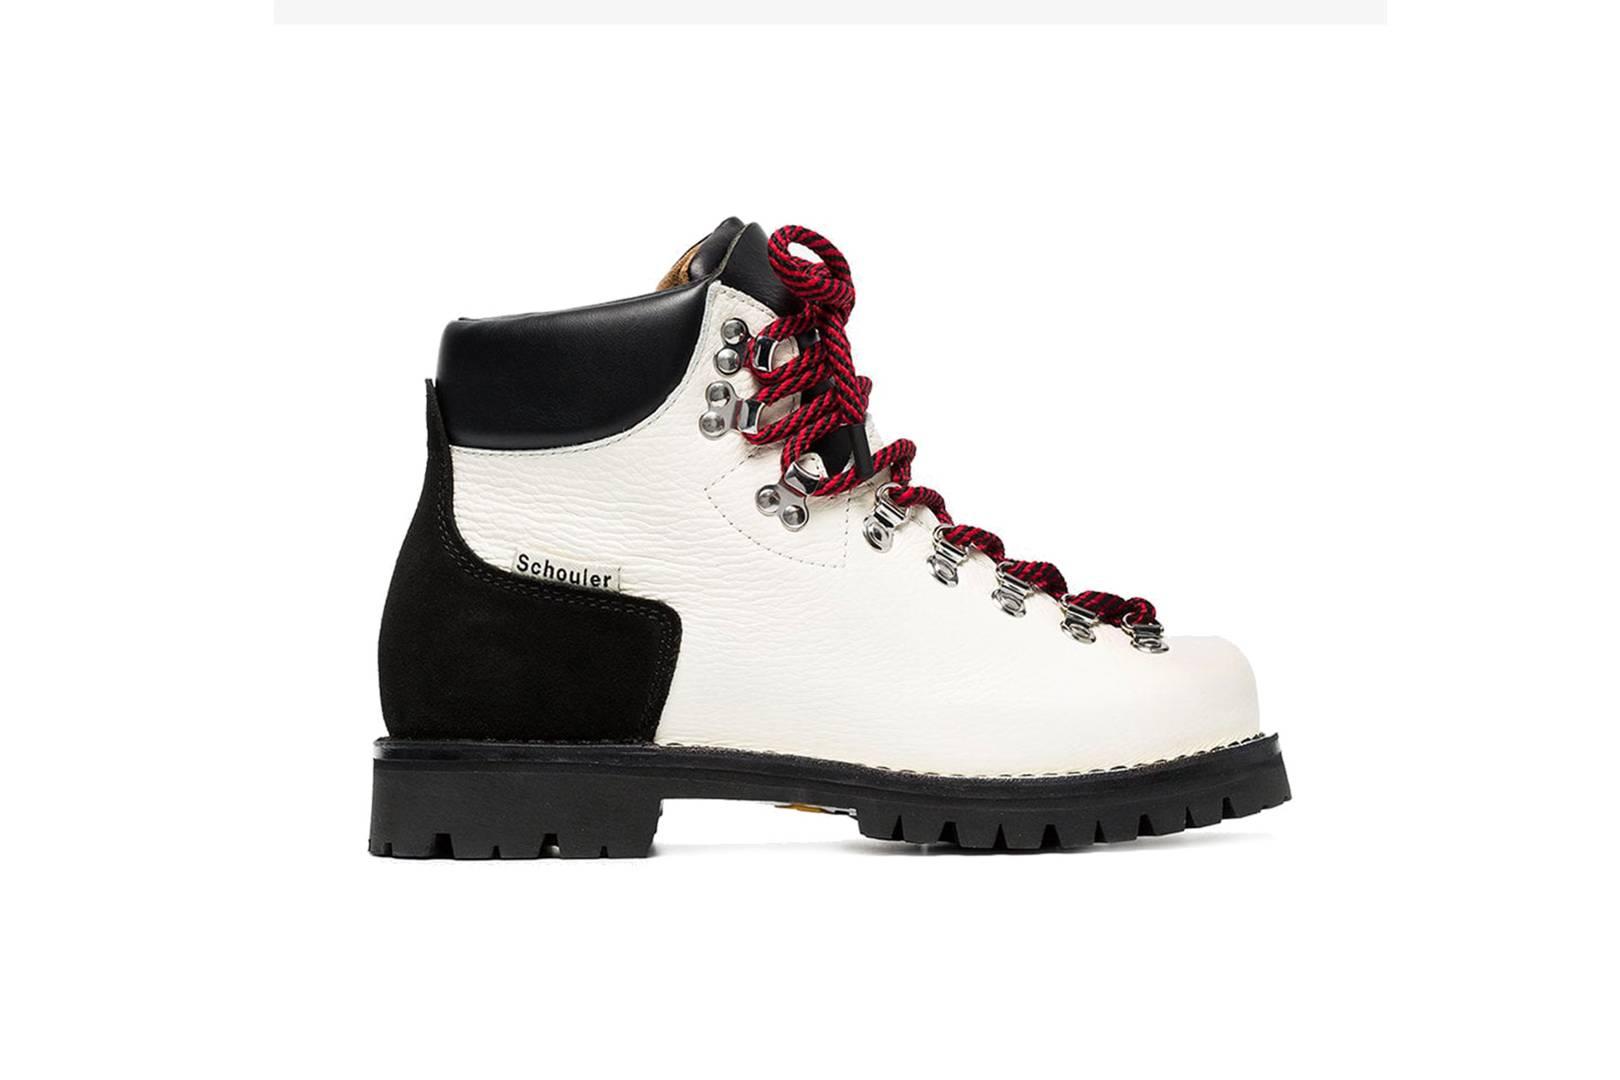 23a56d5fe0e Best Hiking Boots 2018: The Vogue Edit | British Vogue